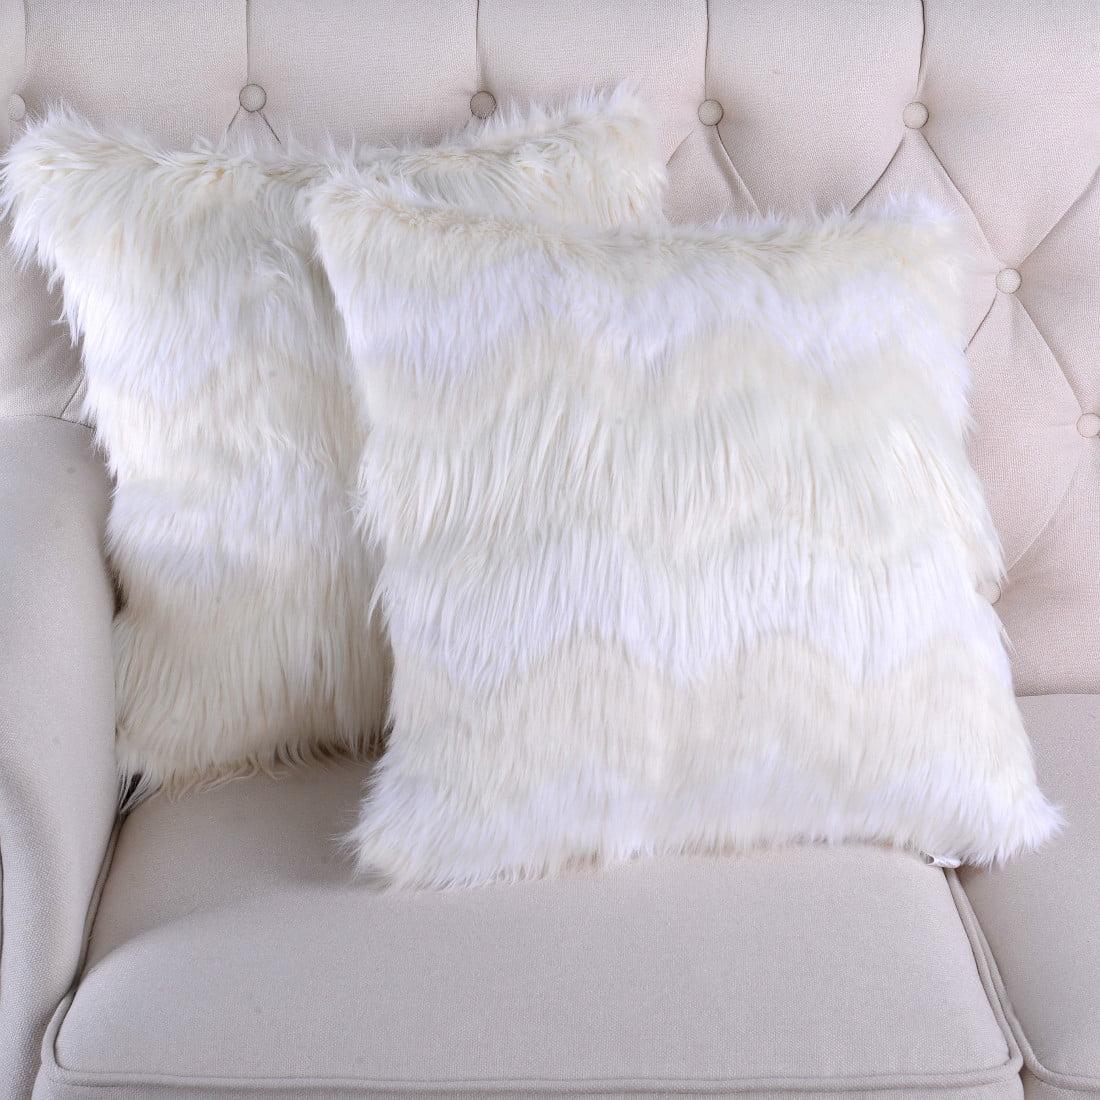 Serenta Chevron Faux Fur 2 Piece Pillow Shells